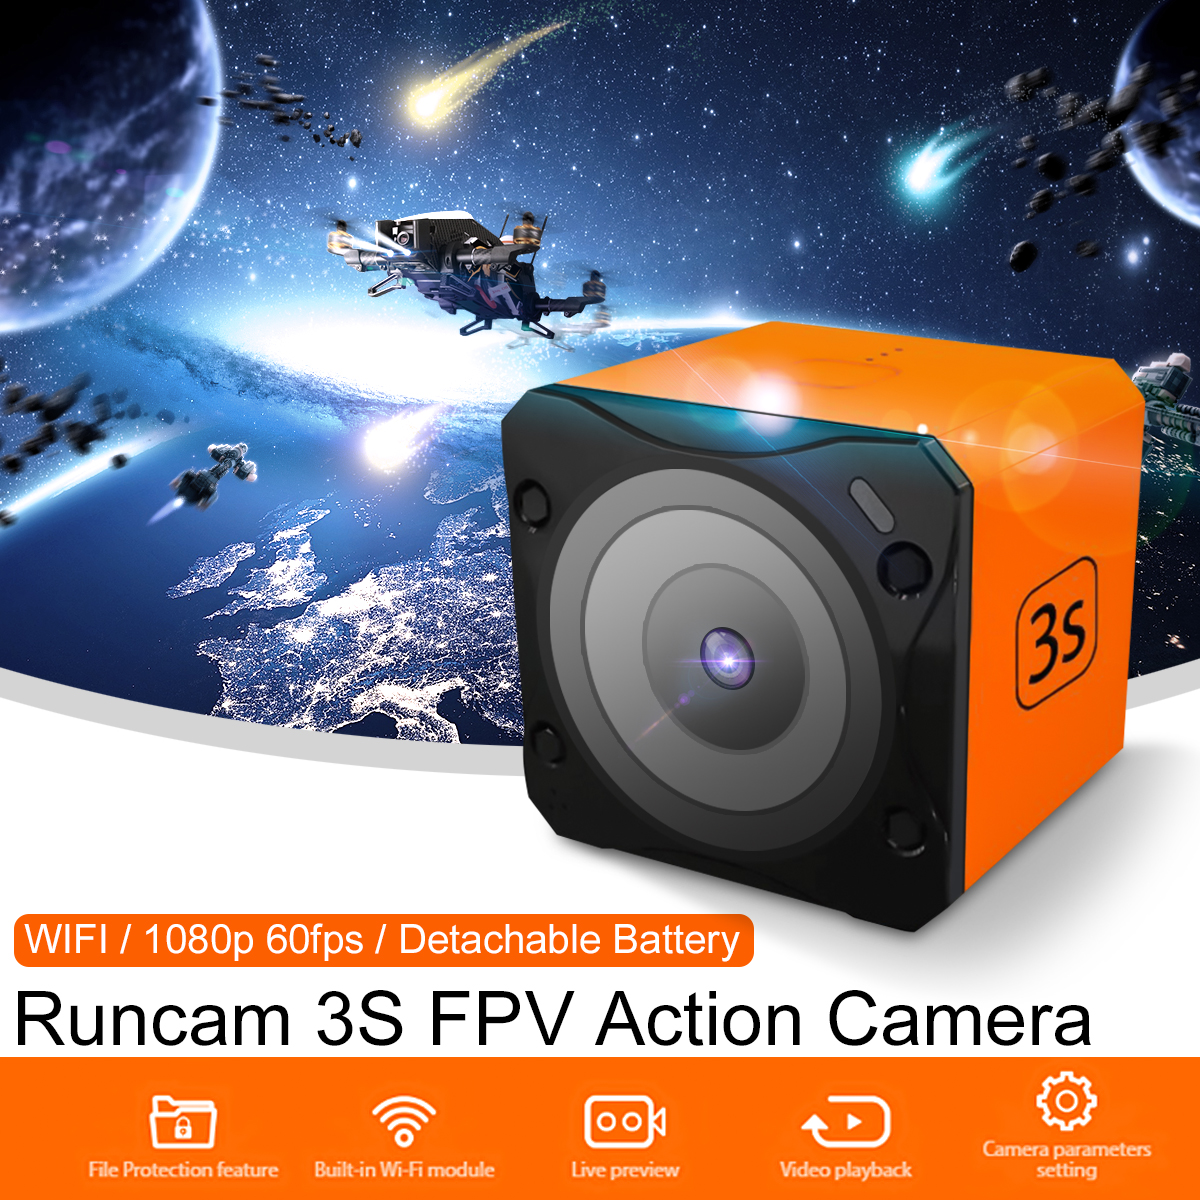 Runcam 3S WIFI NTSC/PAL 1080p 60fps WDR 160 Degree FPV Action Camera Detachable Battery for RC Models VS Runcam3 2018 new runcam 3s ntsc pal wifi 1080p 60fps wdr 160 degree fpv action camera detachable battery for rc racing drone runcam 3